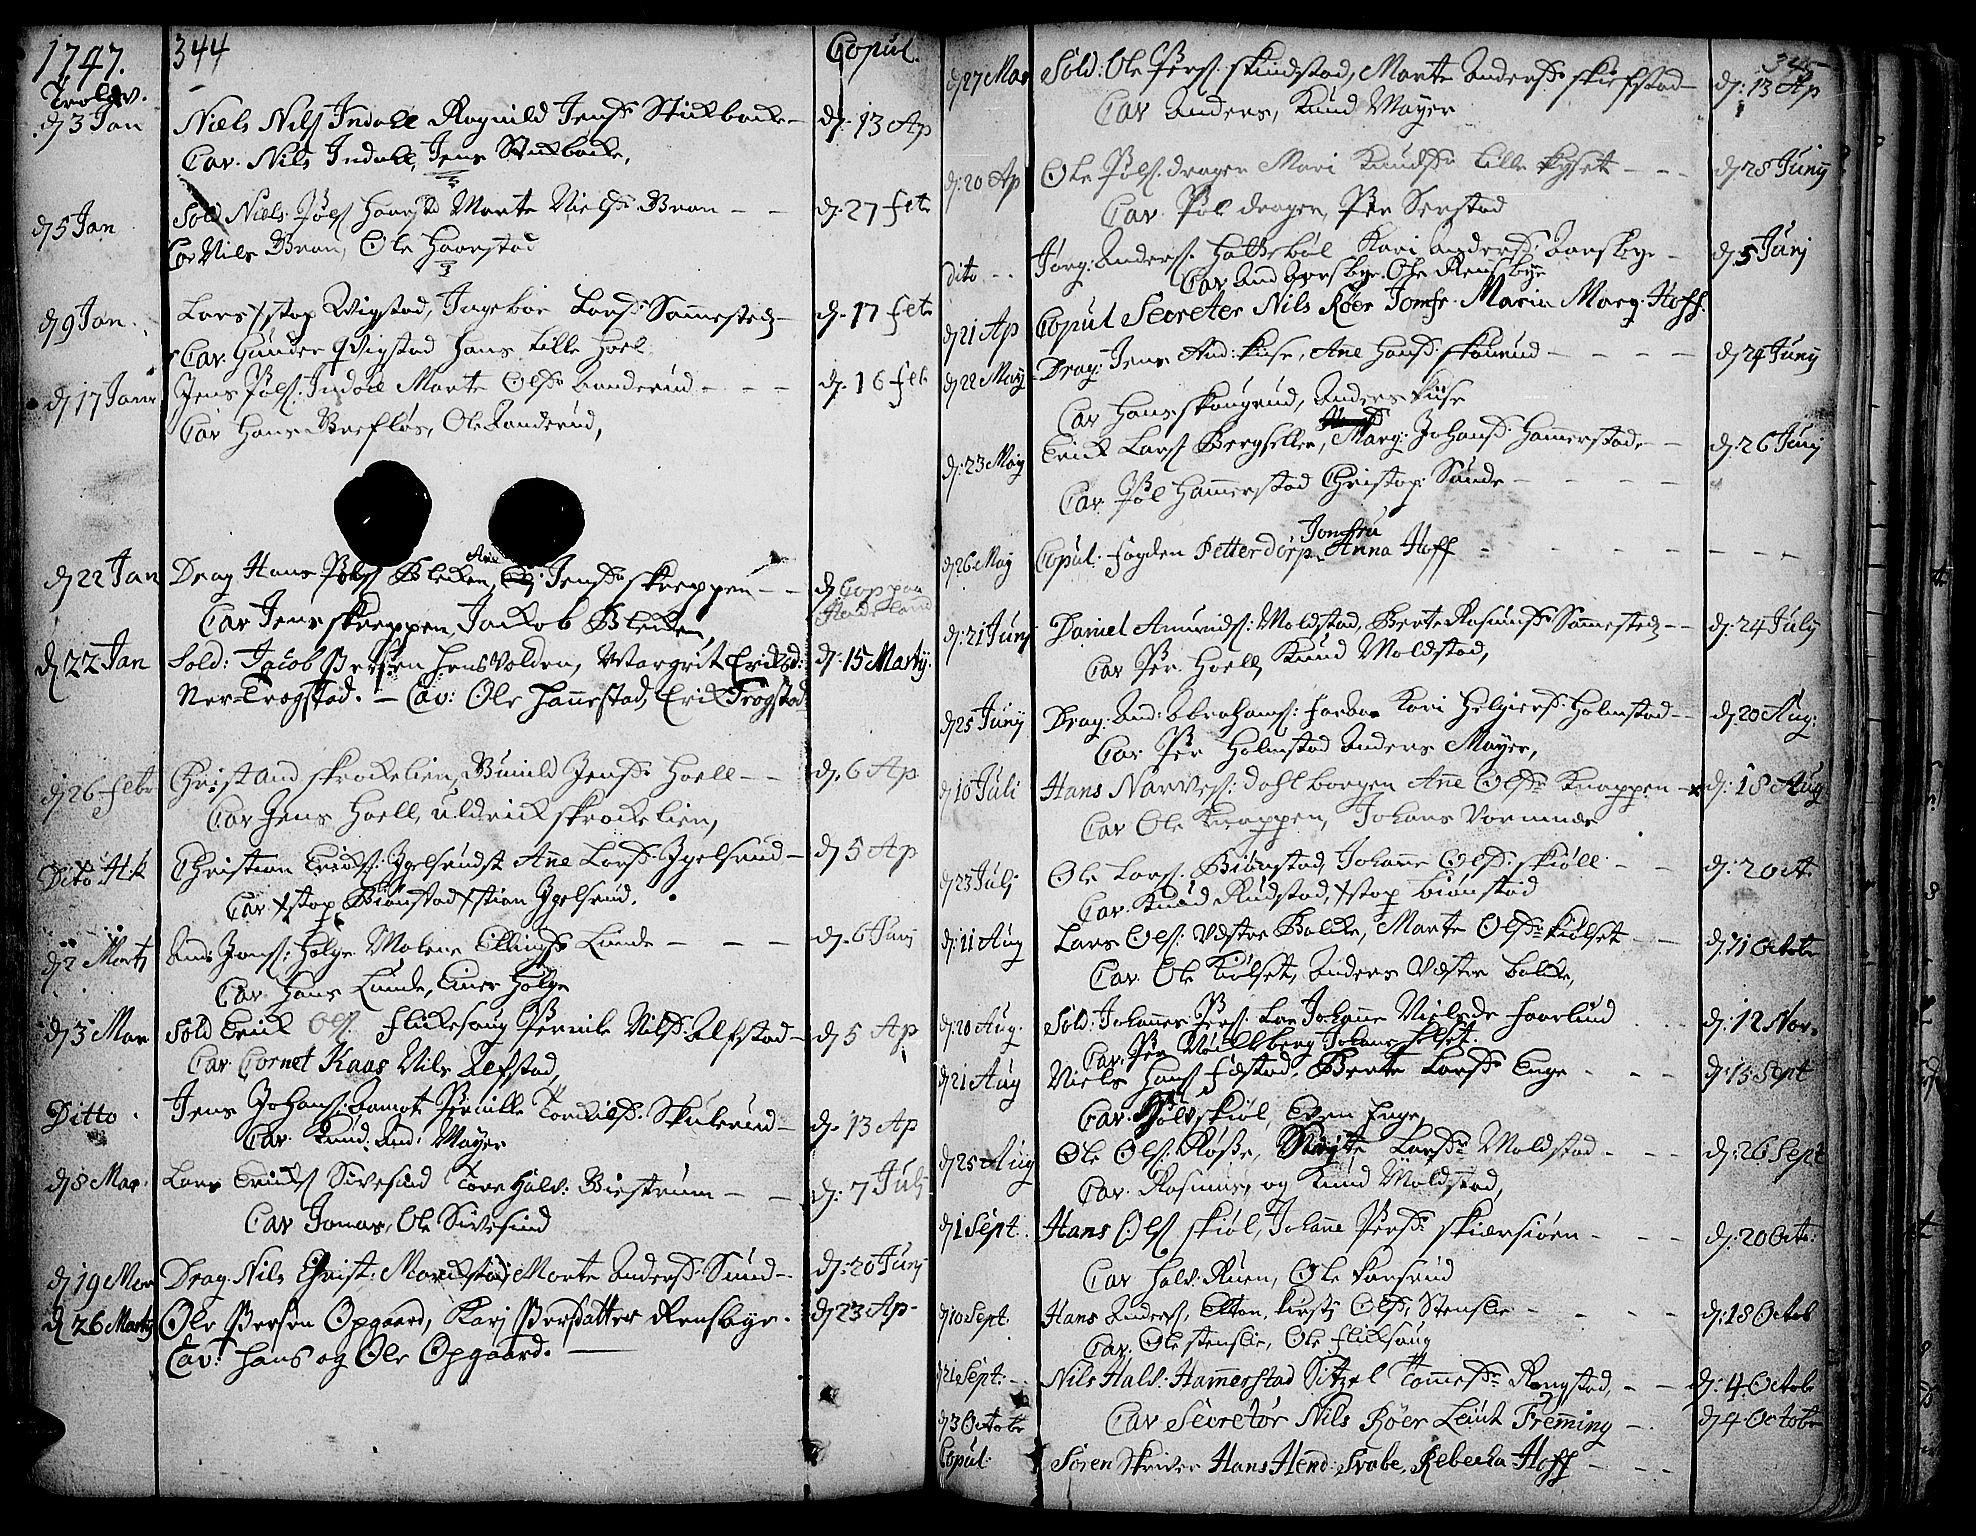 SAH, Toten prestekontor, Ministerialbok nr. 3, 1734-1751, s. 344-345